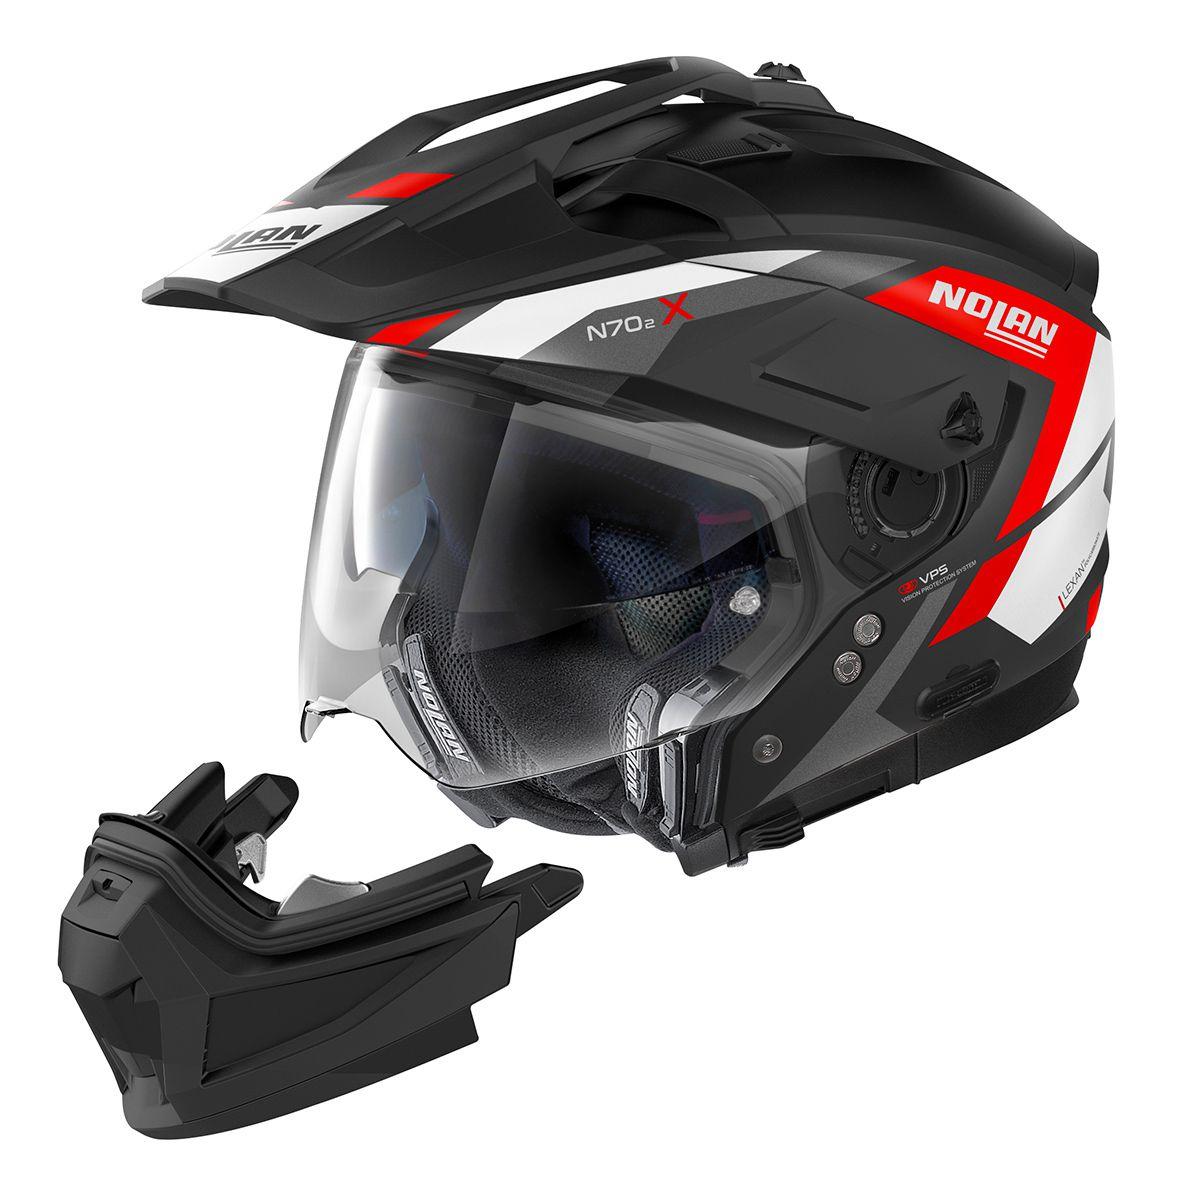 Capacete Nolan N70-2X Grandes Alpes Preto/Vermelho Fosco Big Trail / Off-Road C/ Viseira Solar - Ganhe Touca Balaclava  - Motosports